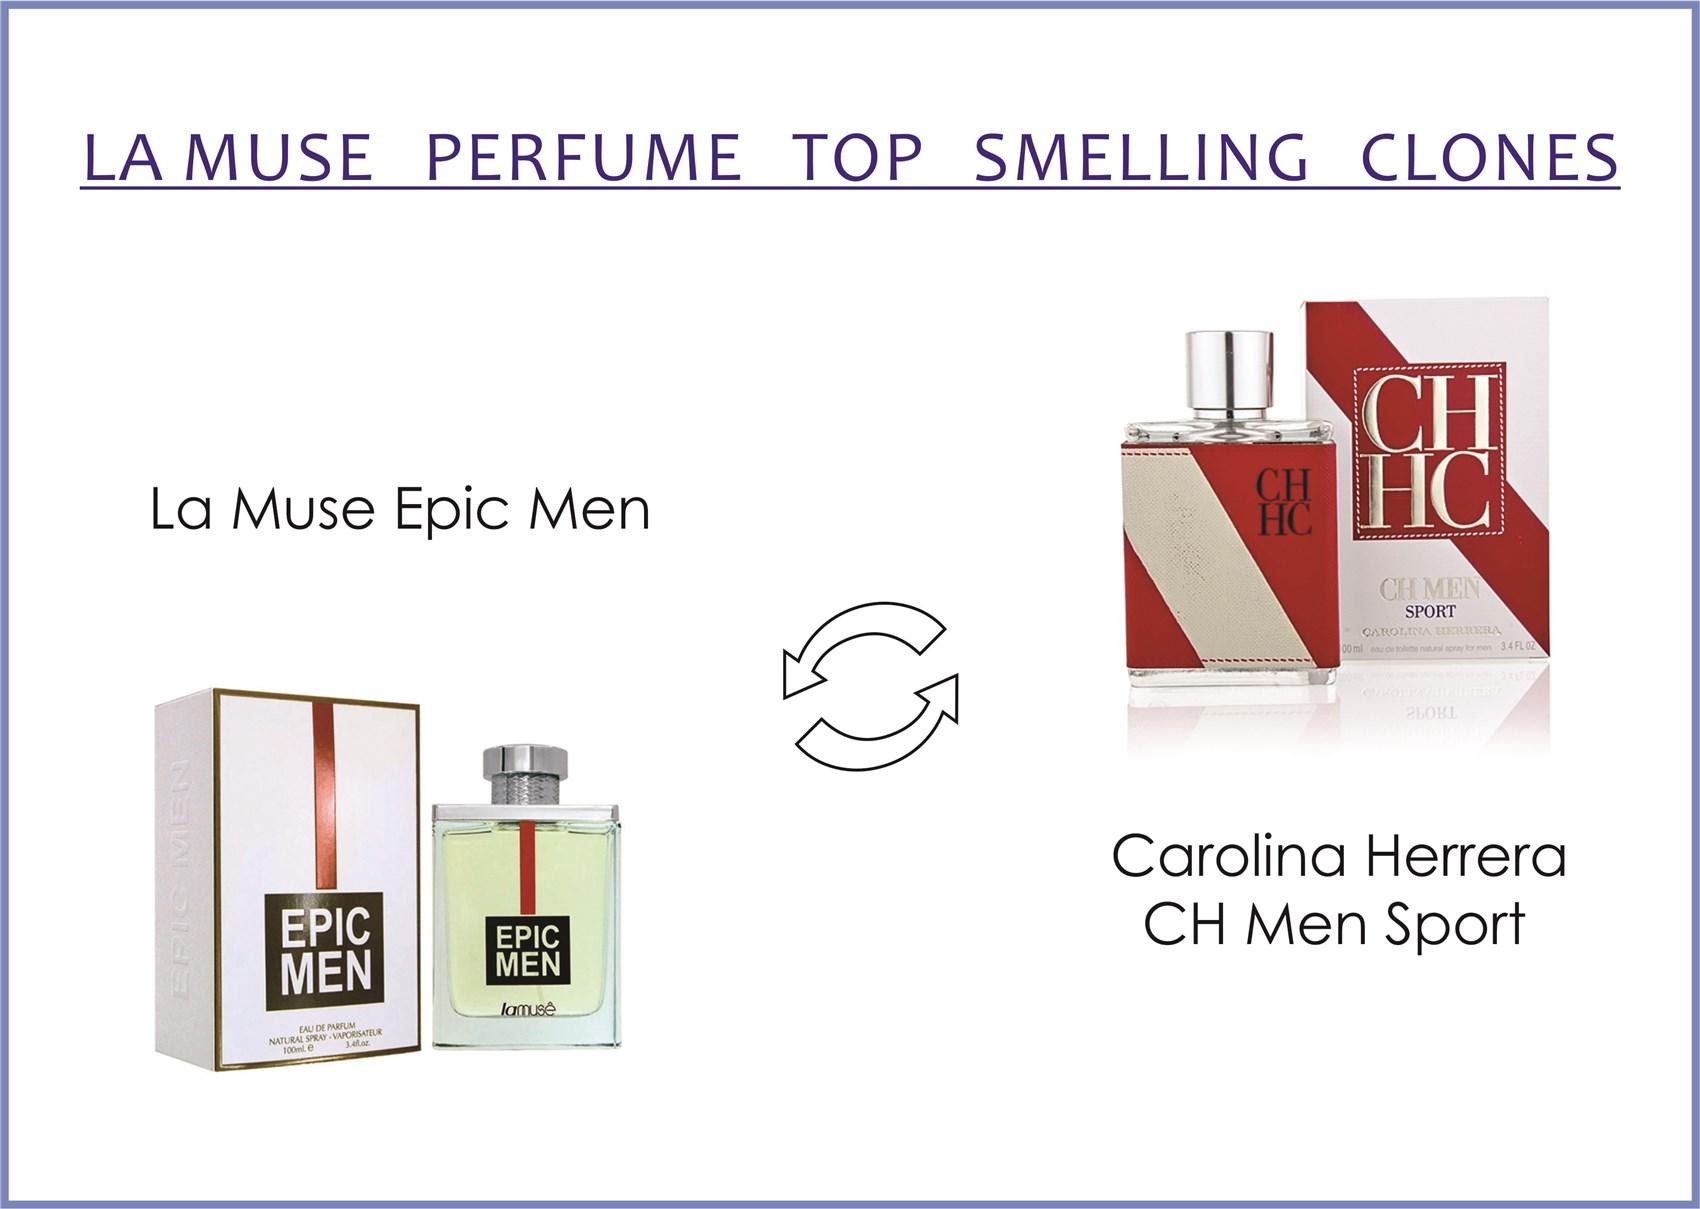 la-muse-epic-men-for-men-100-ml-edp-by-lattafa-perfumes-carolina-herrera-ch-men-sport